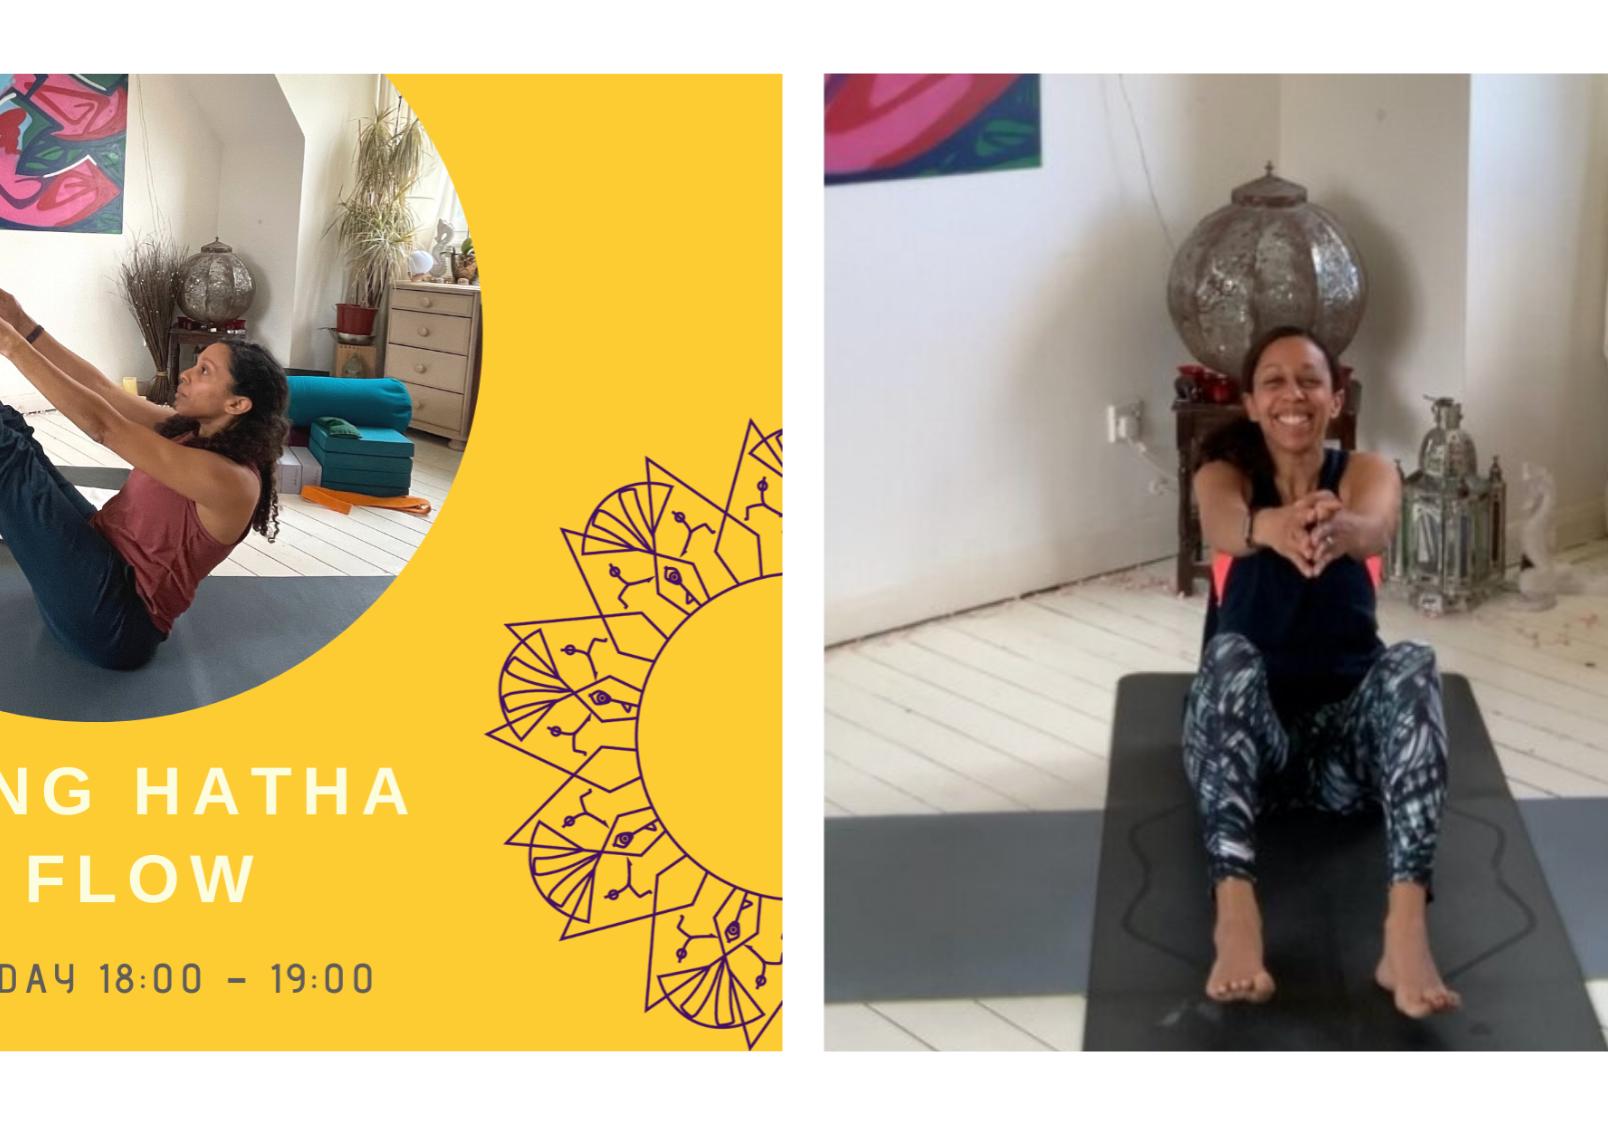 3.-Tuesday-18.00-19.00-Zoom-Mele-Yoga-Yang-Hatha-Flow.png